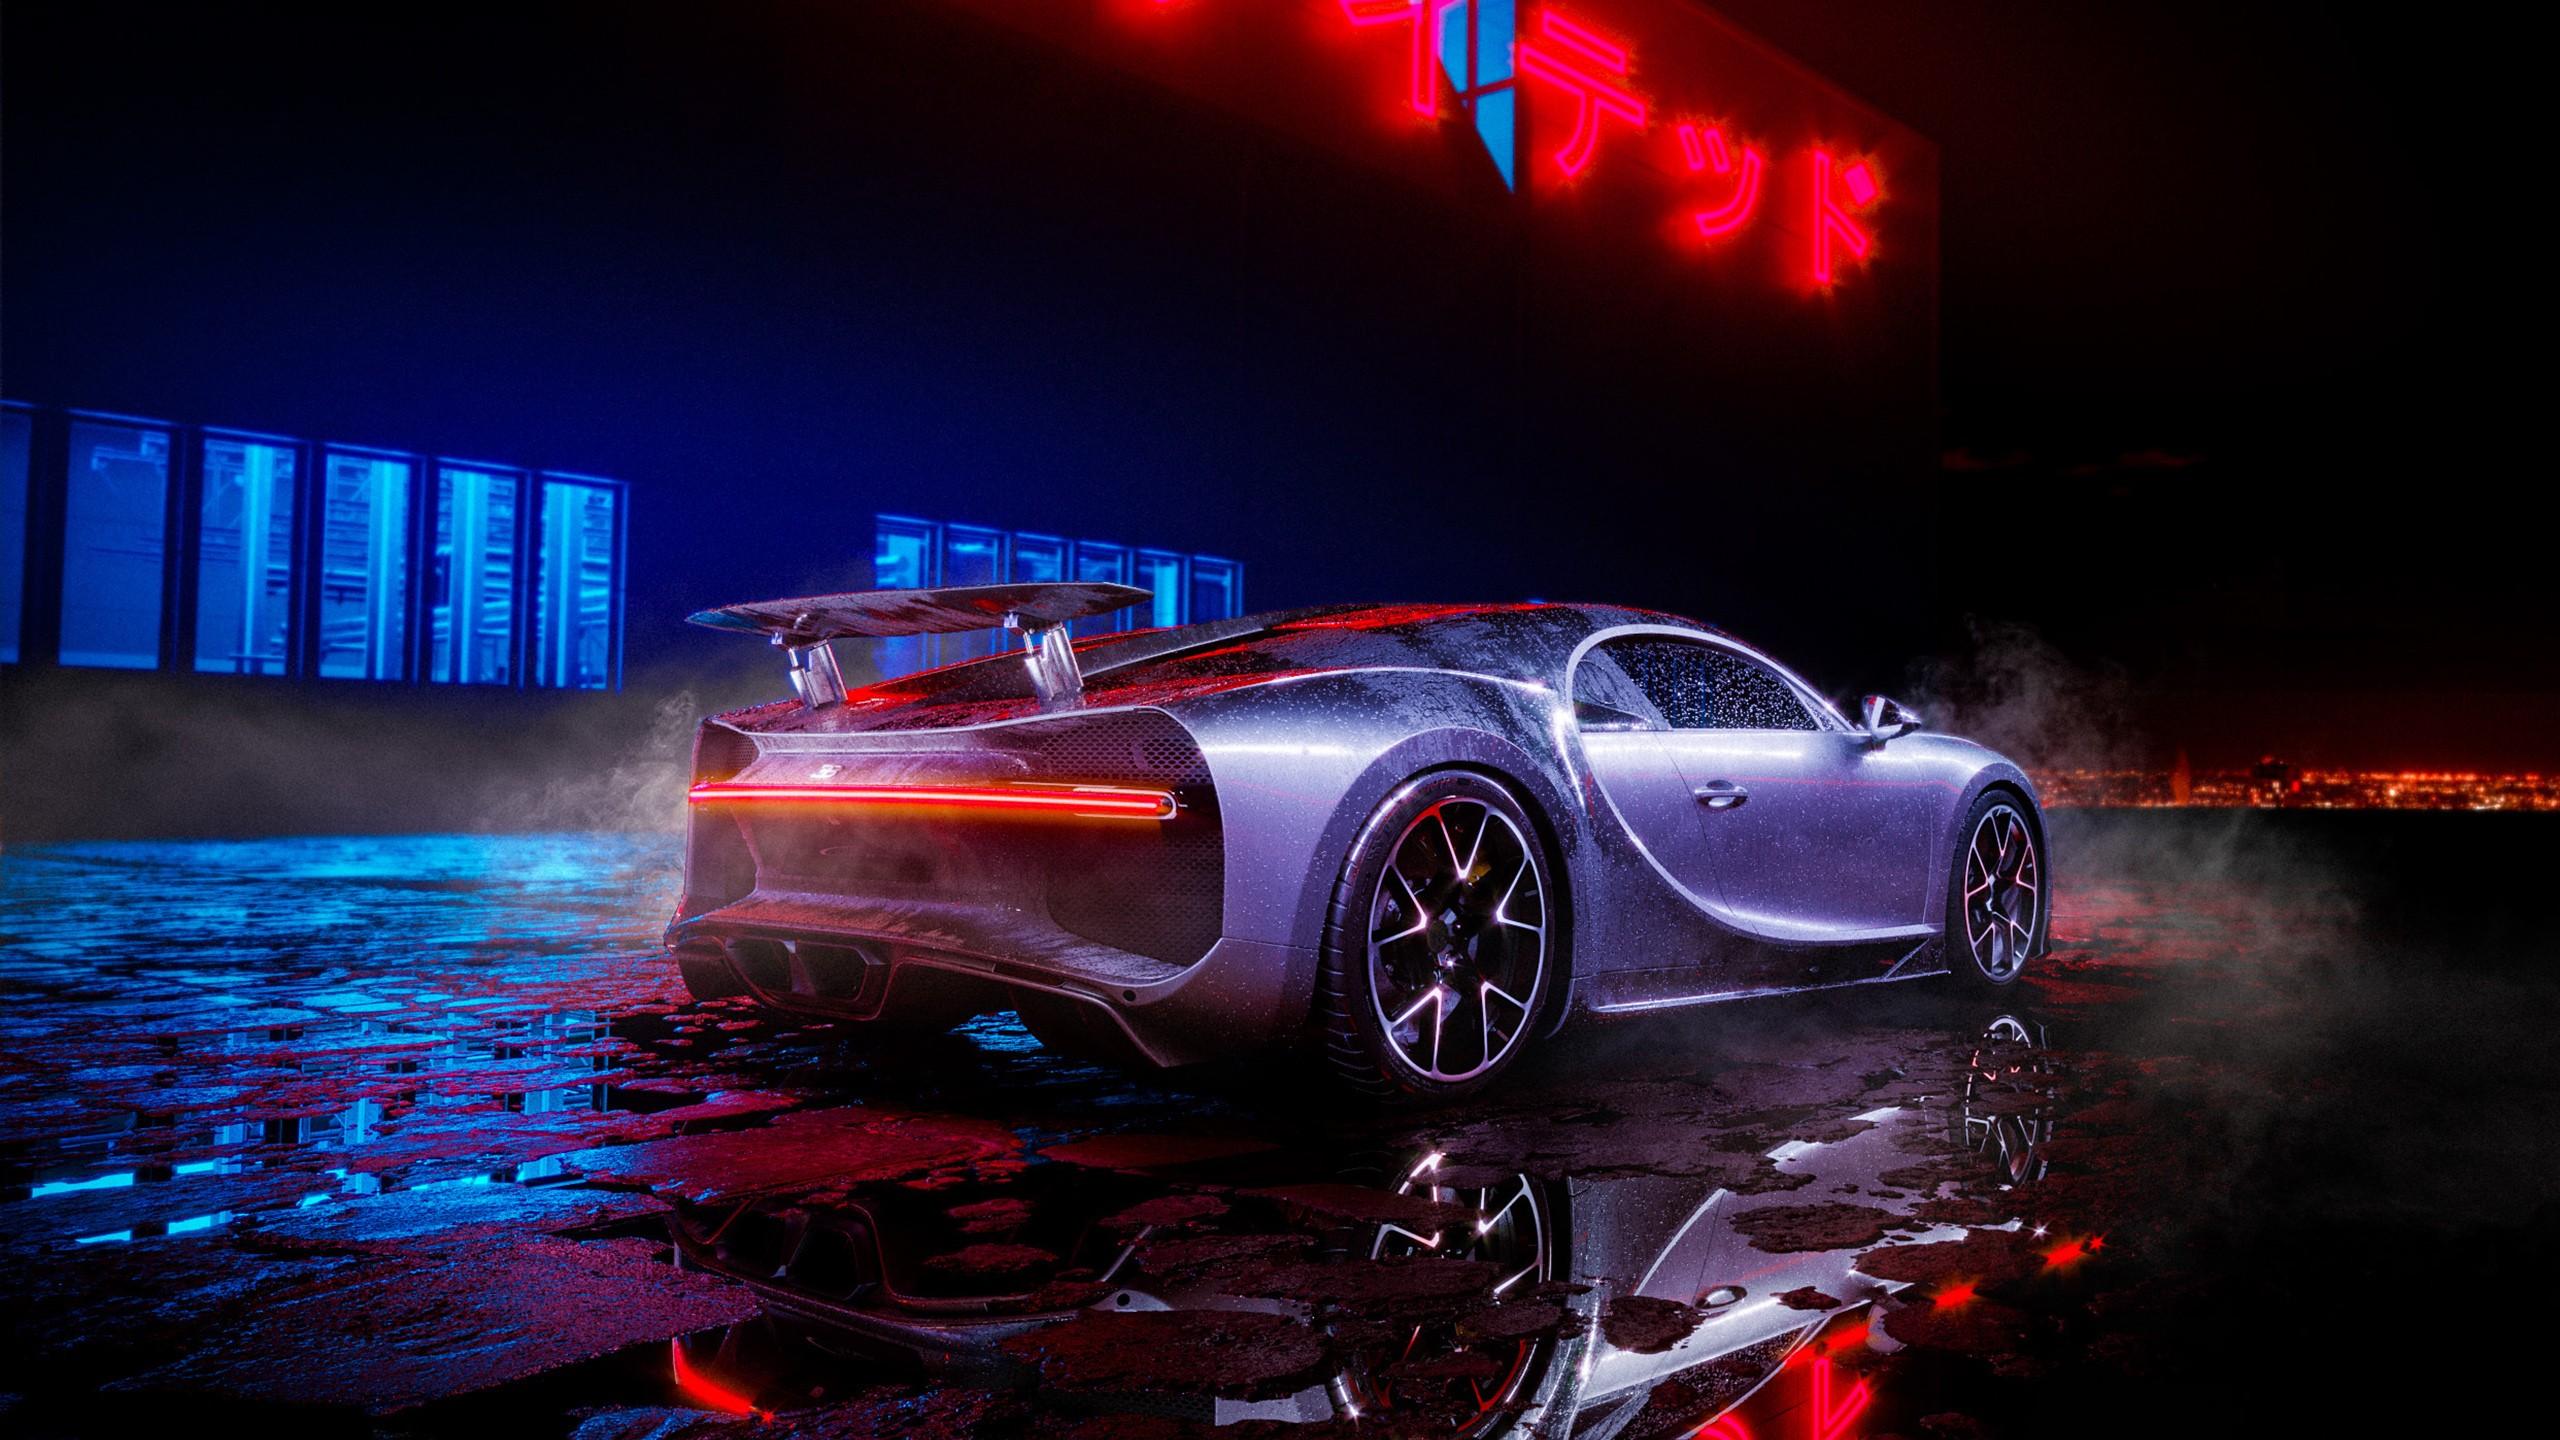 Hd Car Wallpapers For Pc 1024x768 Bugatti Chiron Neon Lights Wallpapers Hd Wallpapers Id